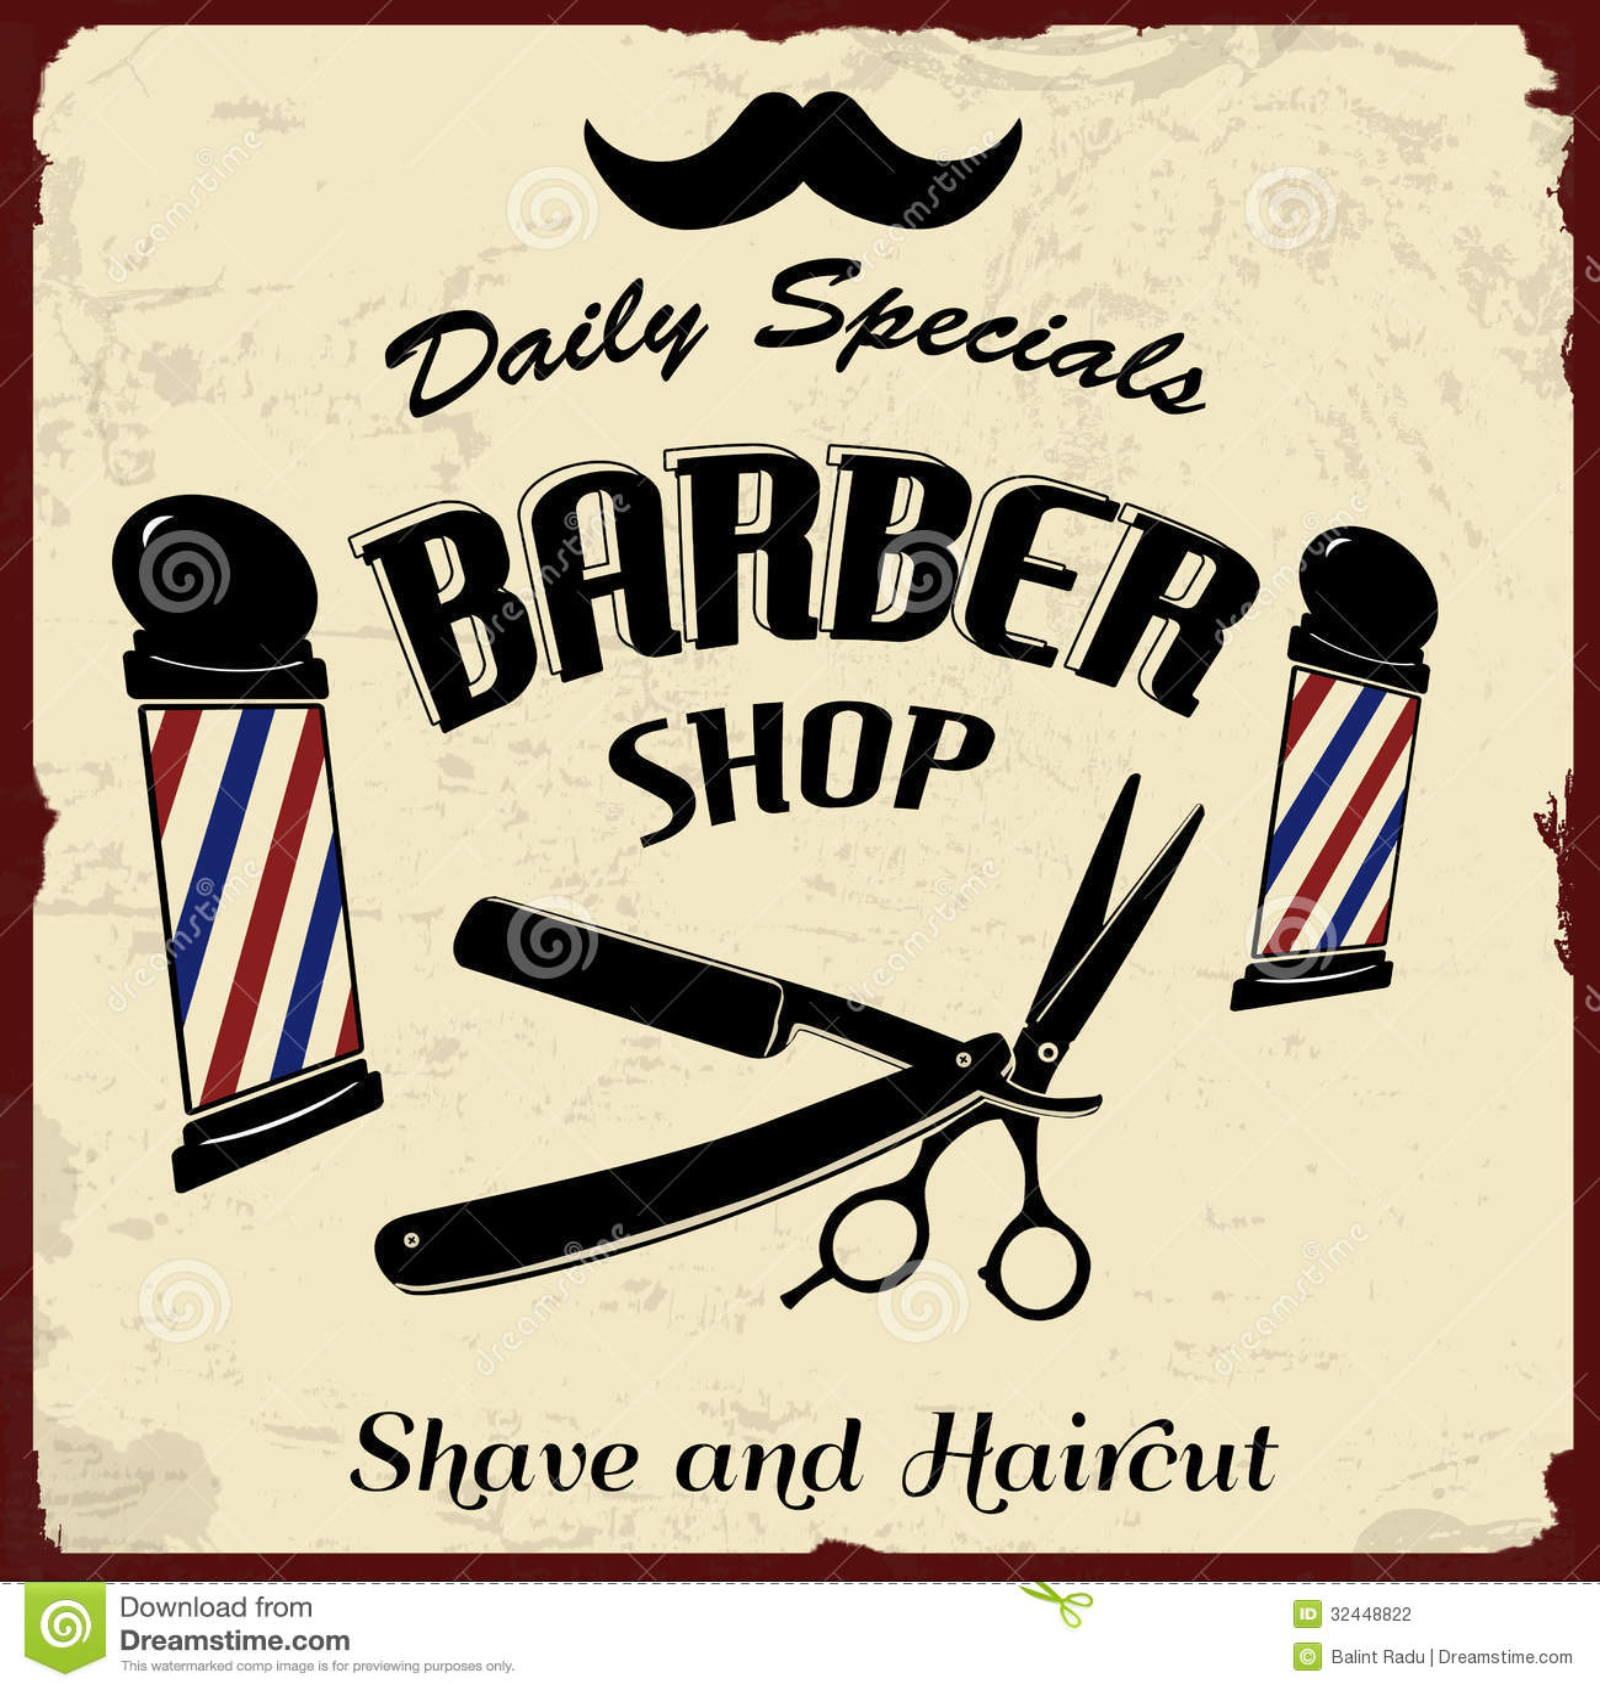 Free Barber Shop Business Plan Financial News 2016 Car Release Date